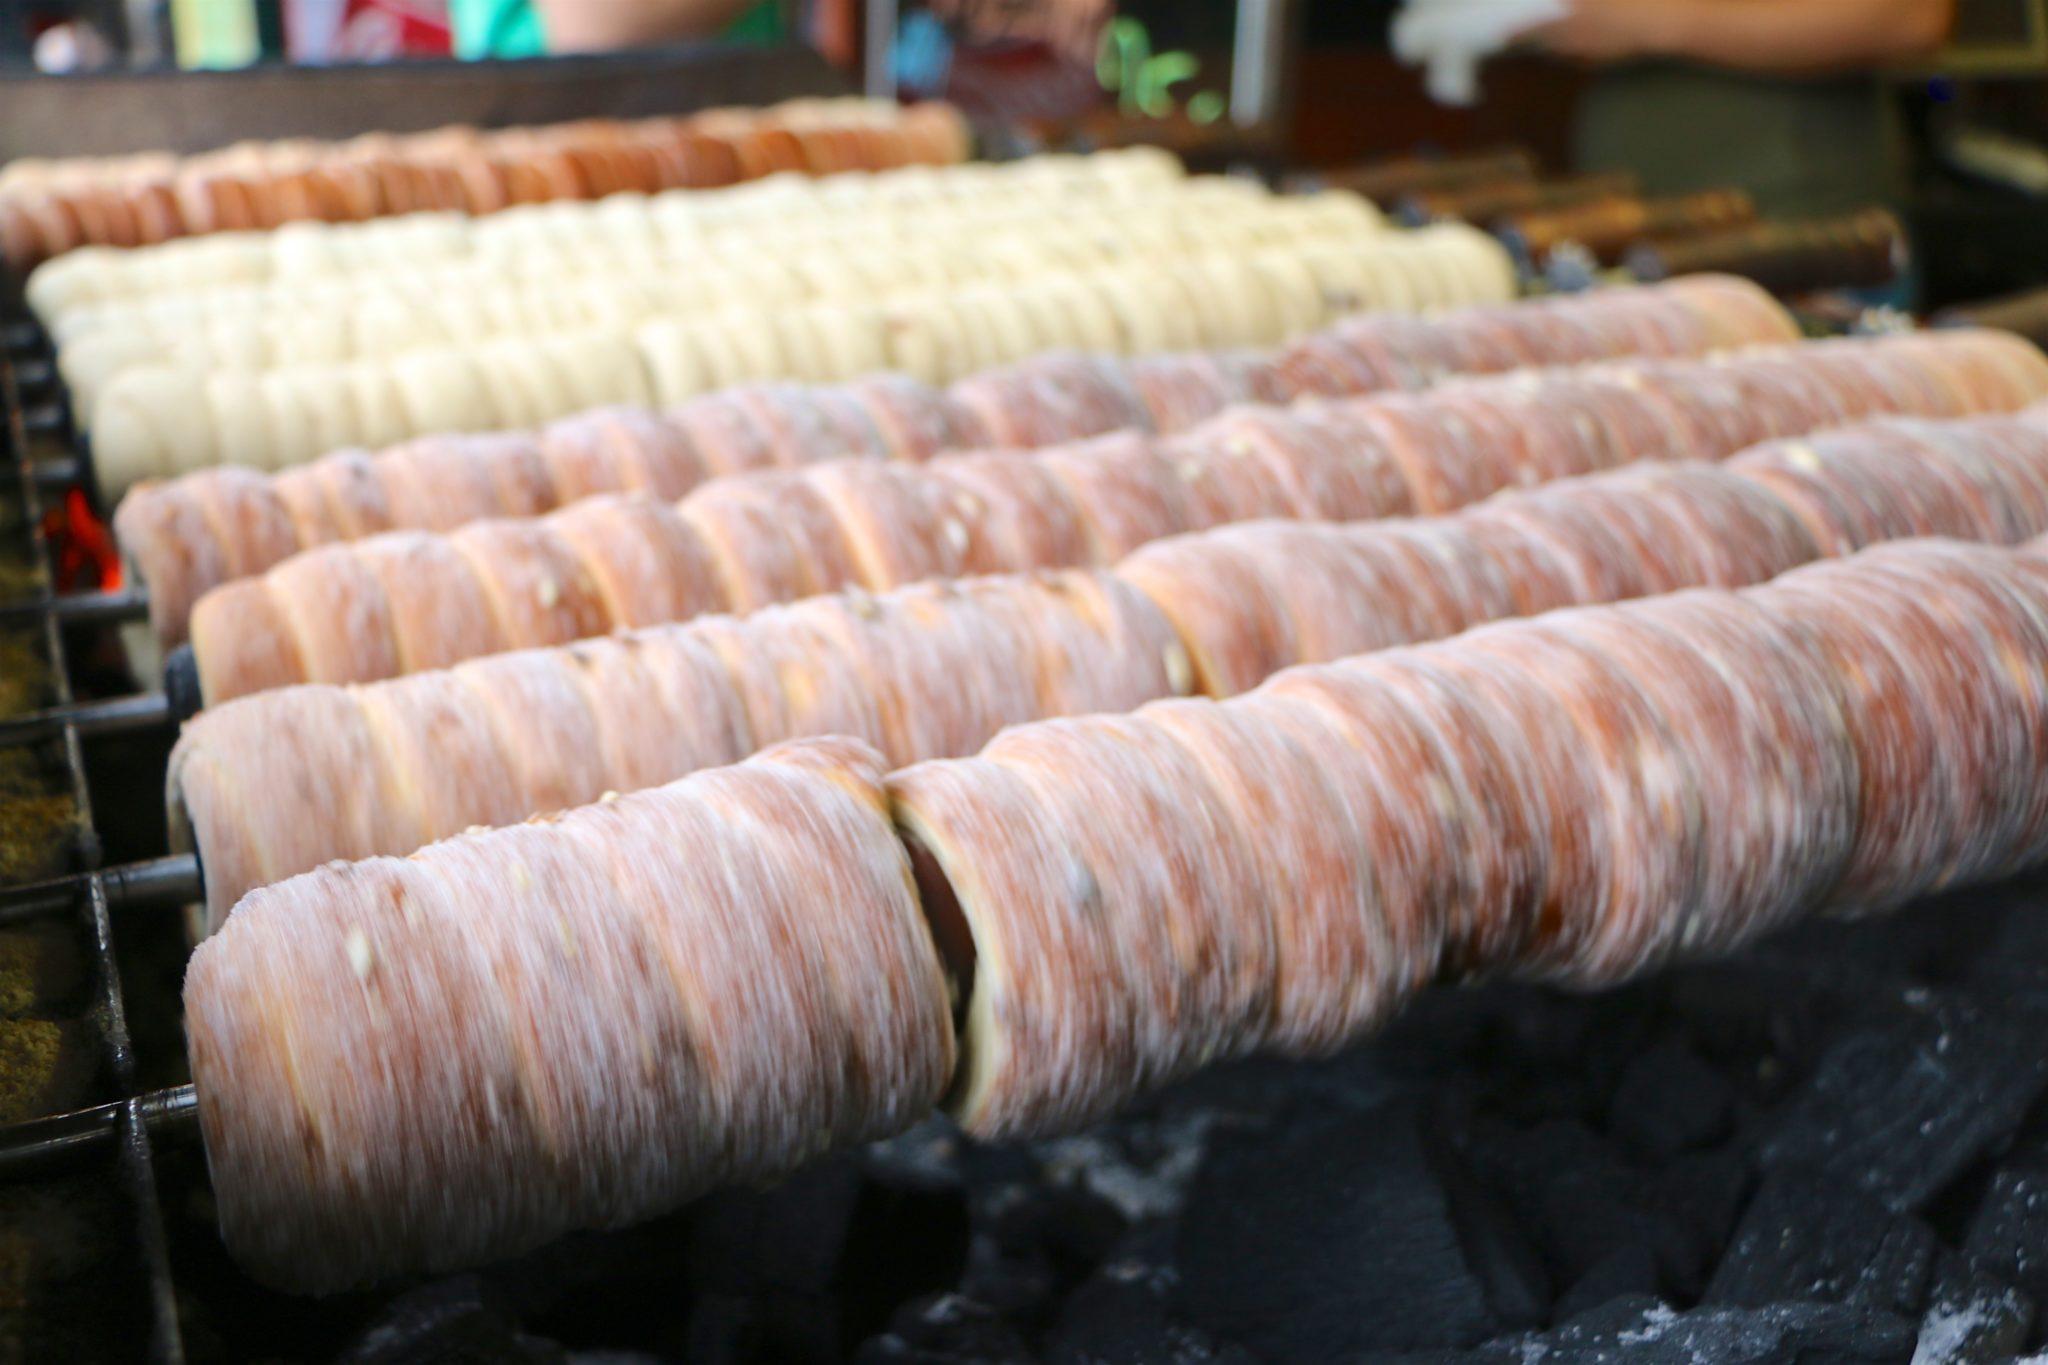 Trdelník: The Chimney Cake